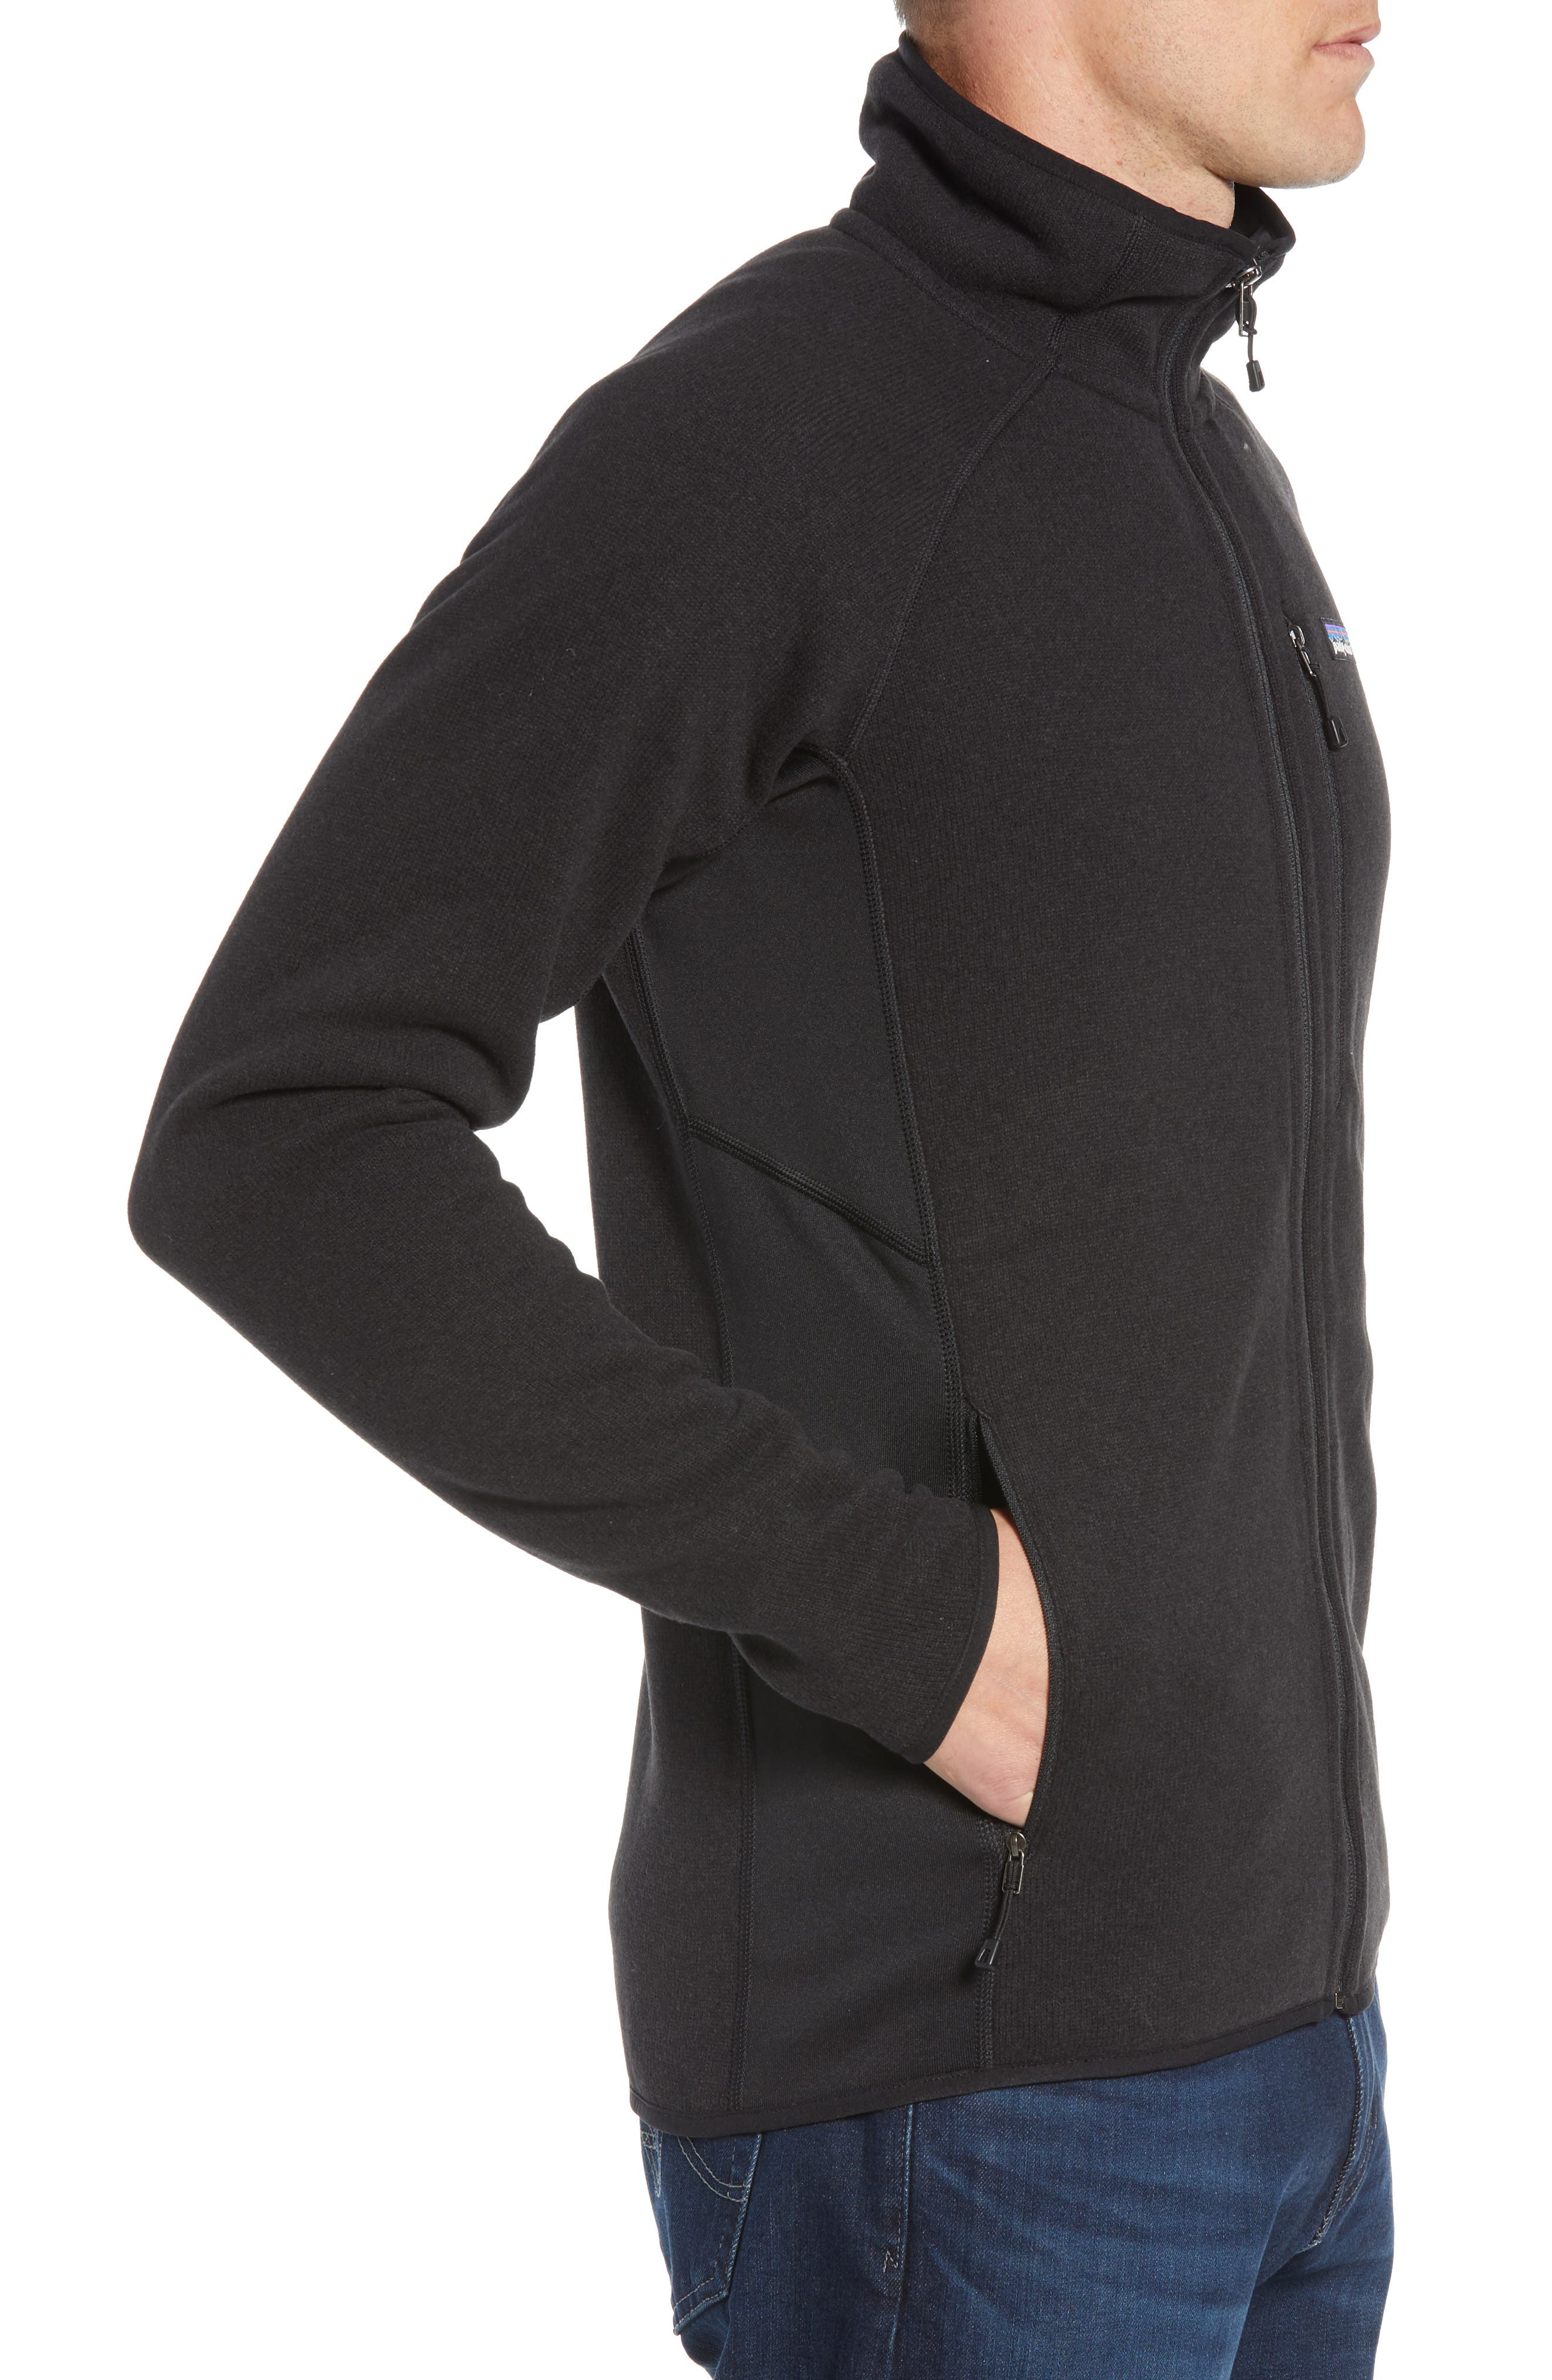 Better Sweater<sup>®</sup> Performance Slim Fit Zip Jacket,                             Alternate thumbnail 4, color,                             BLK